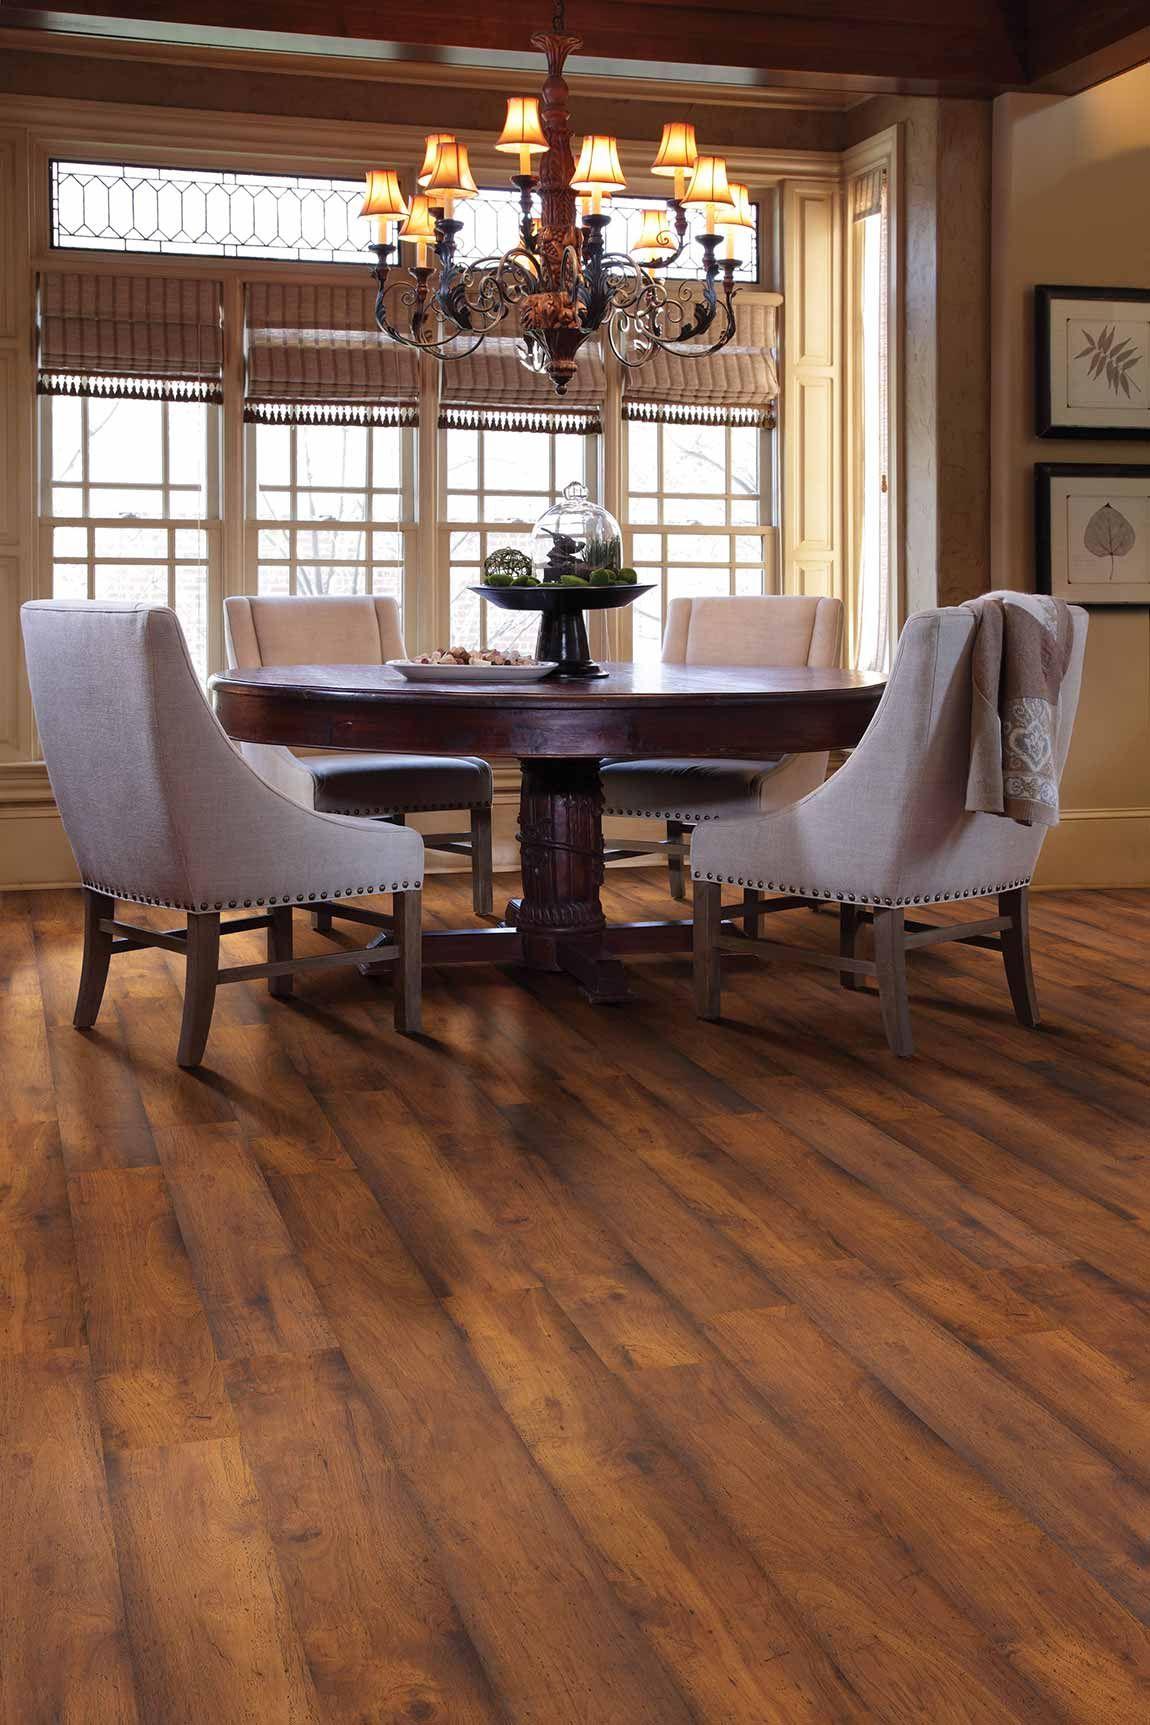 Rustic Farmhouse Dining Room Flooring Designs Flooring America